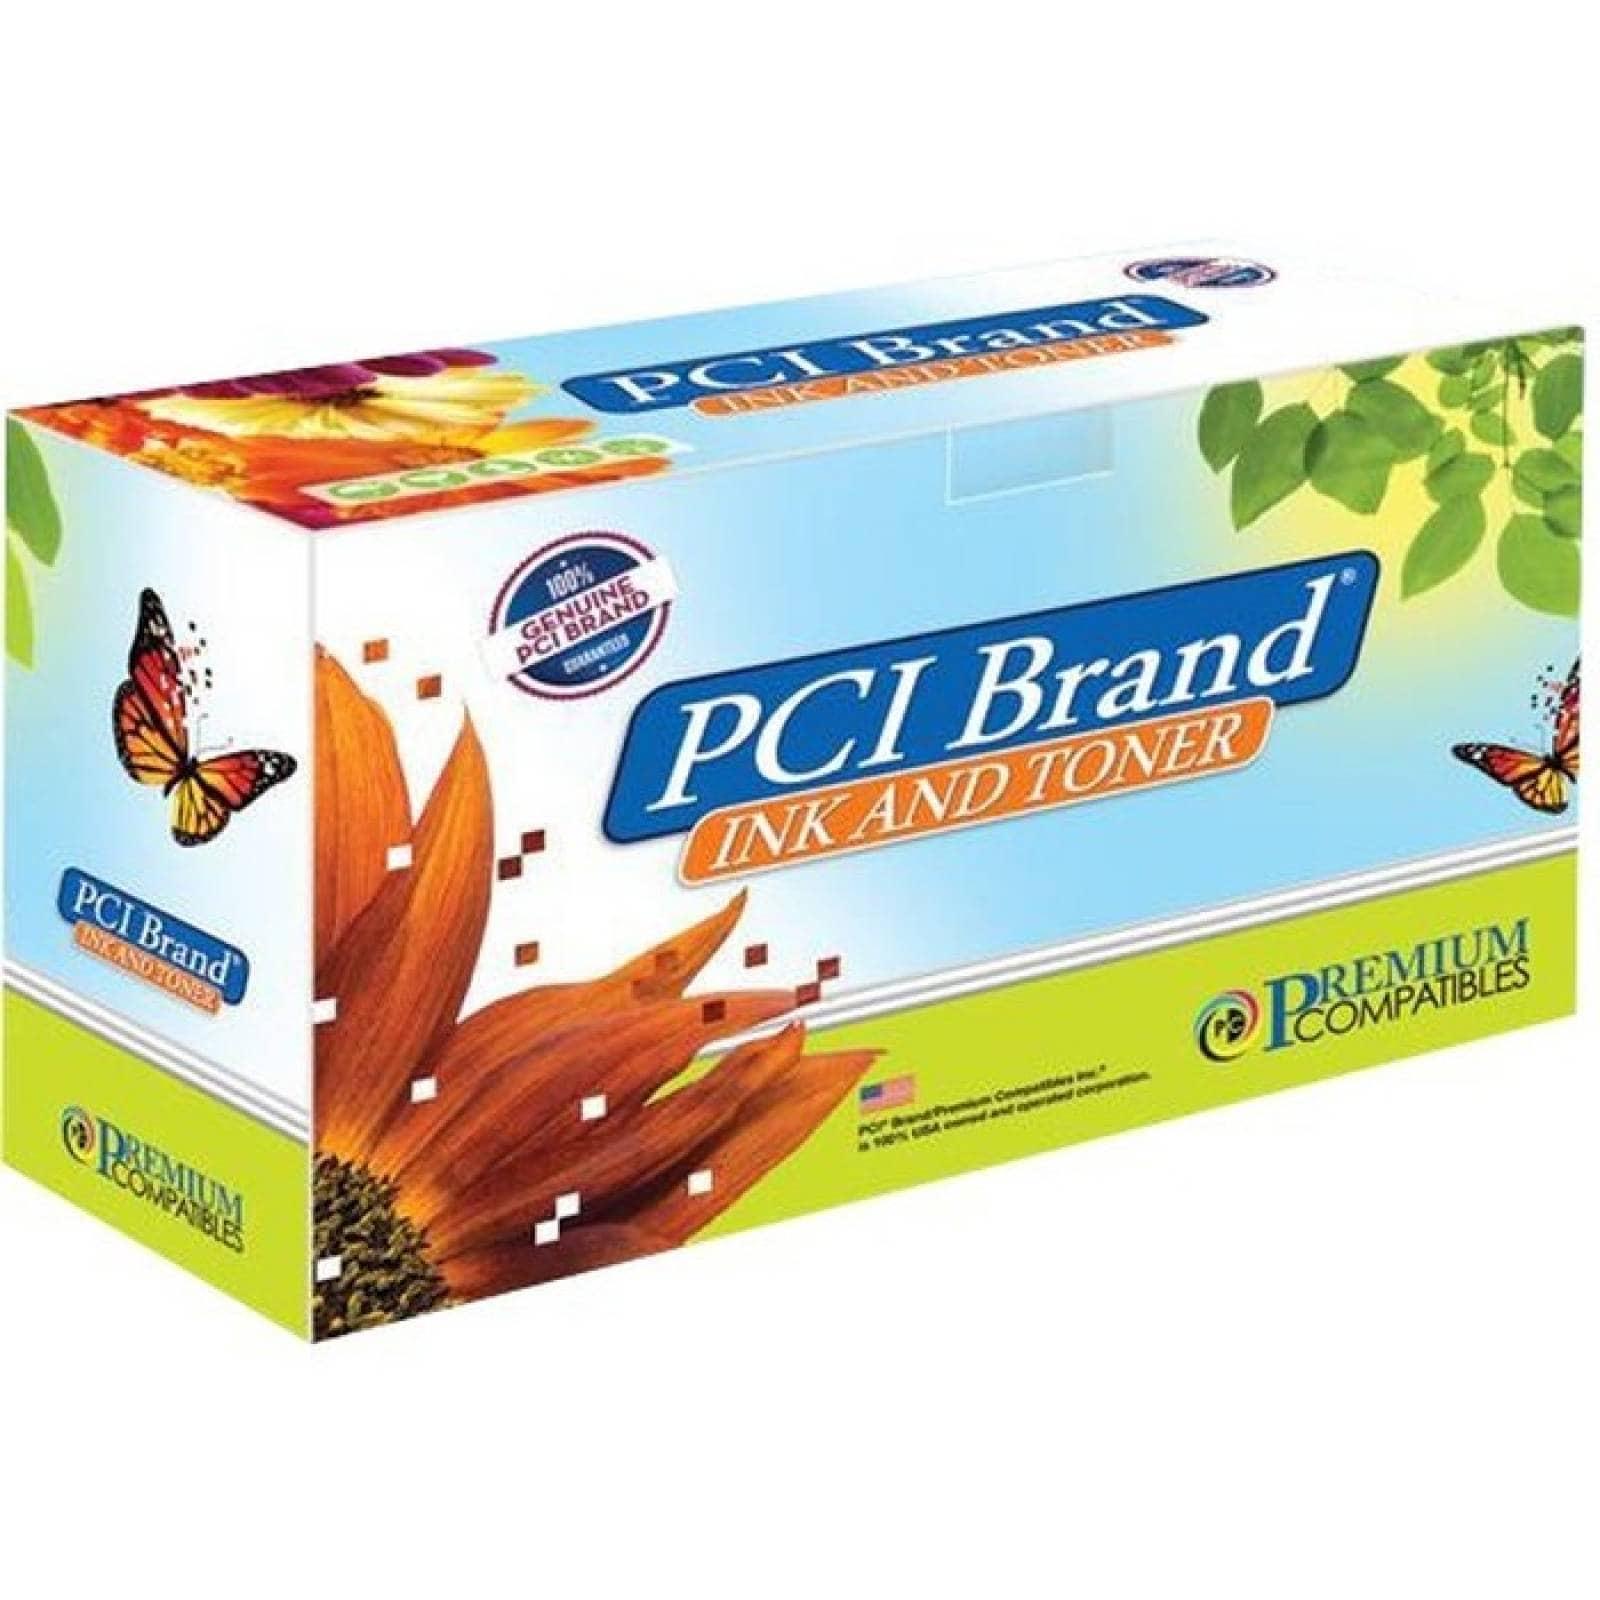 Cartucho de tner compatible premium  Alternativa para Okidata (44469721)  Cian